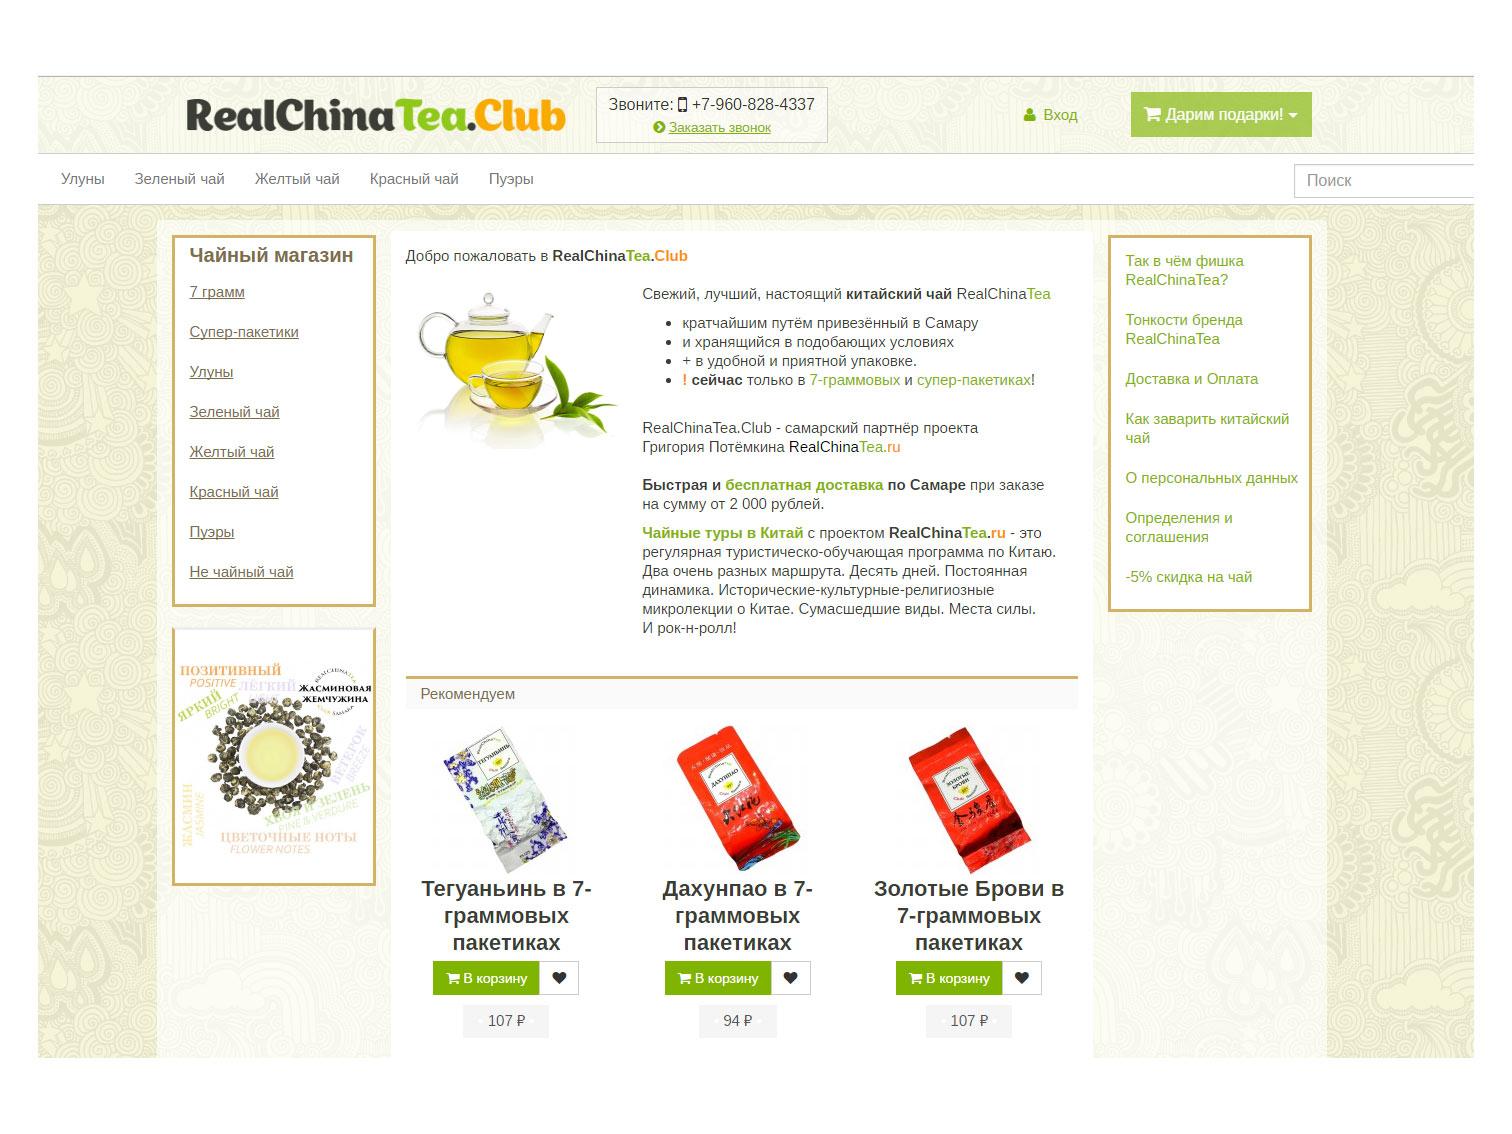 Разработка сайтов в Самаре. Владимир Матвеев. WEB-дизайн. Сайт интернет-магазина чая RealChinaTea.Club